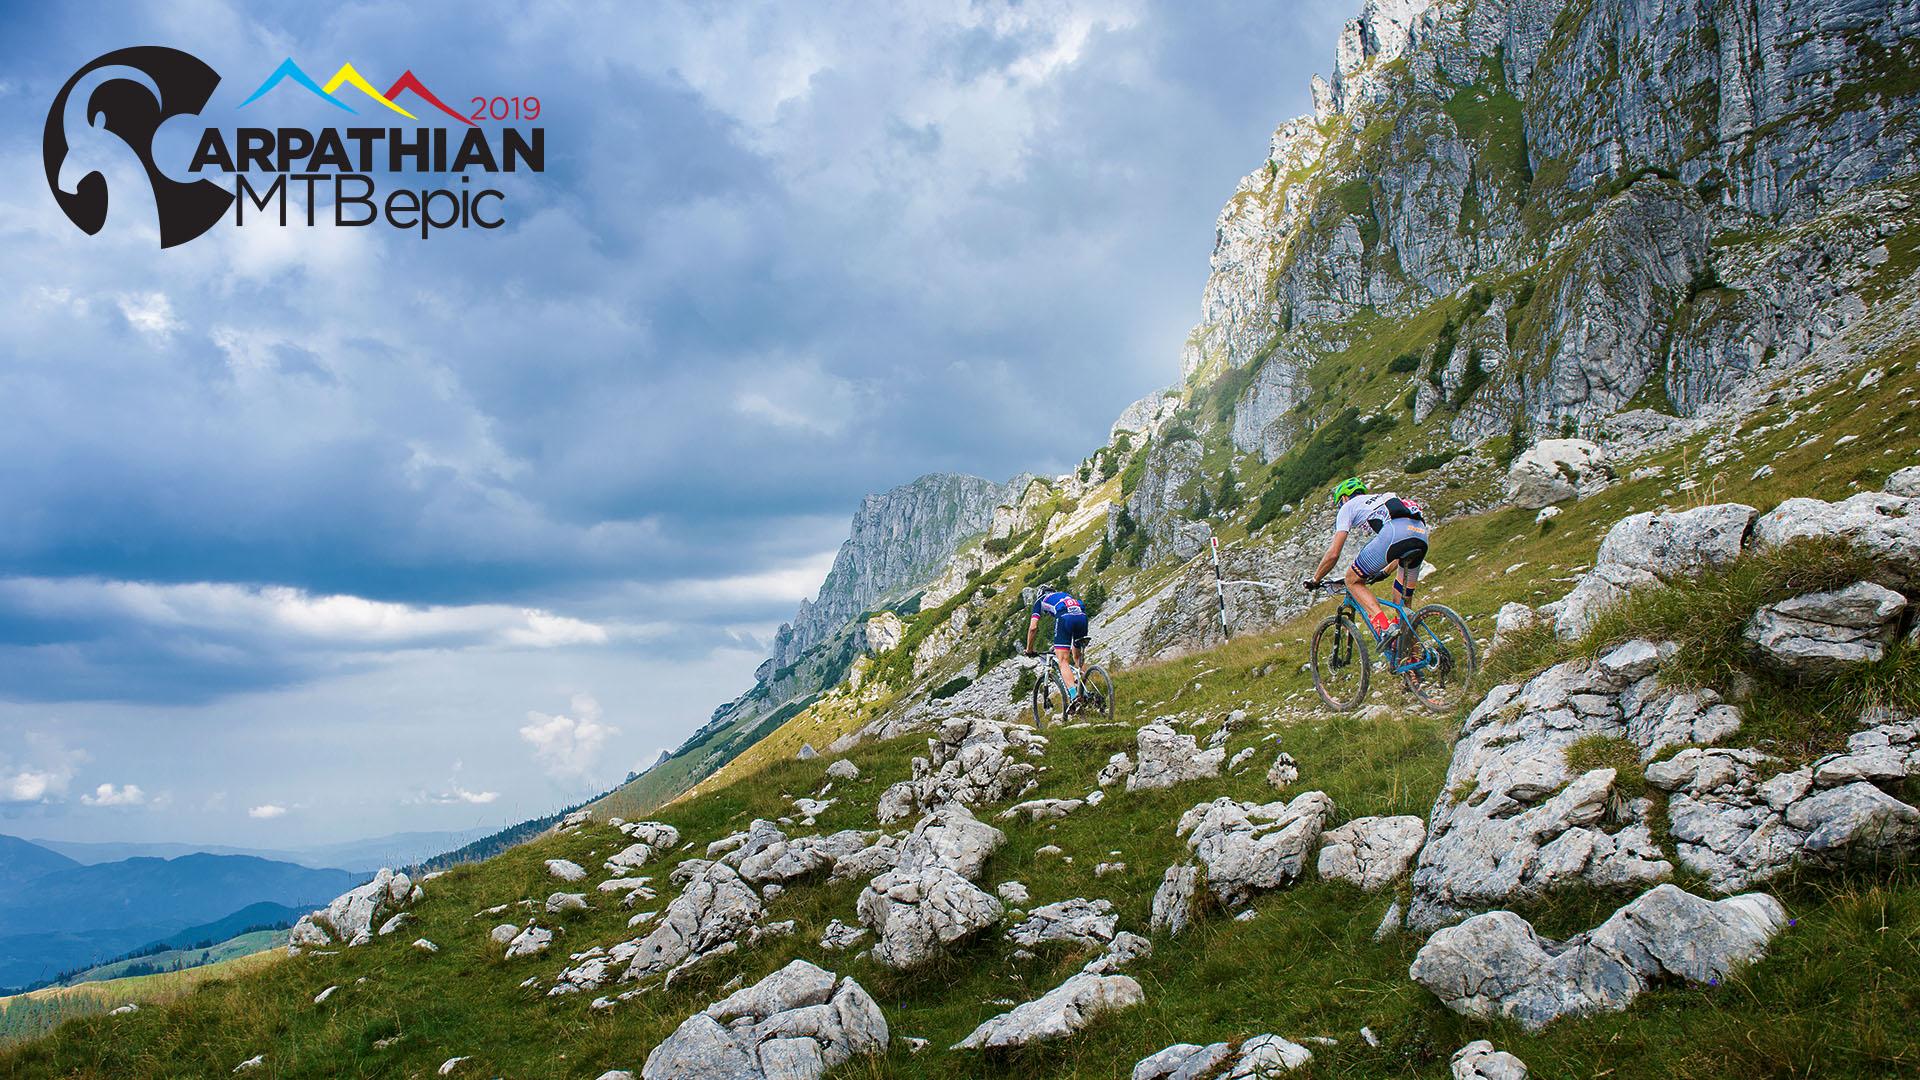 traseu Carpathian MTB Epic